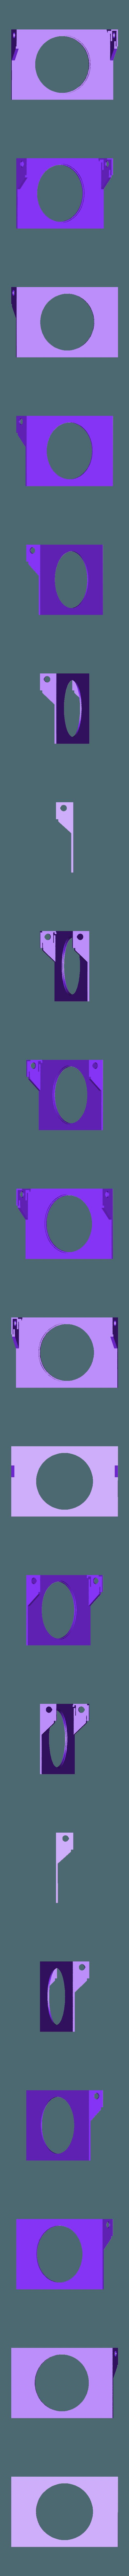 LogoCassette1_RoundHole.stl Download free STL file Cassette Tape Case with Customizable Logos / Album Art • 3D printable model, tonyyoungblood